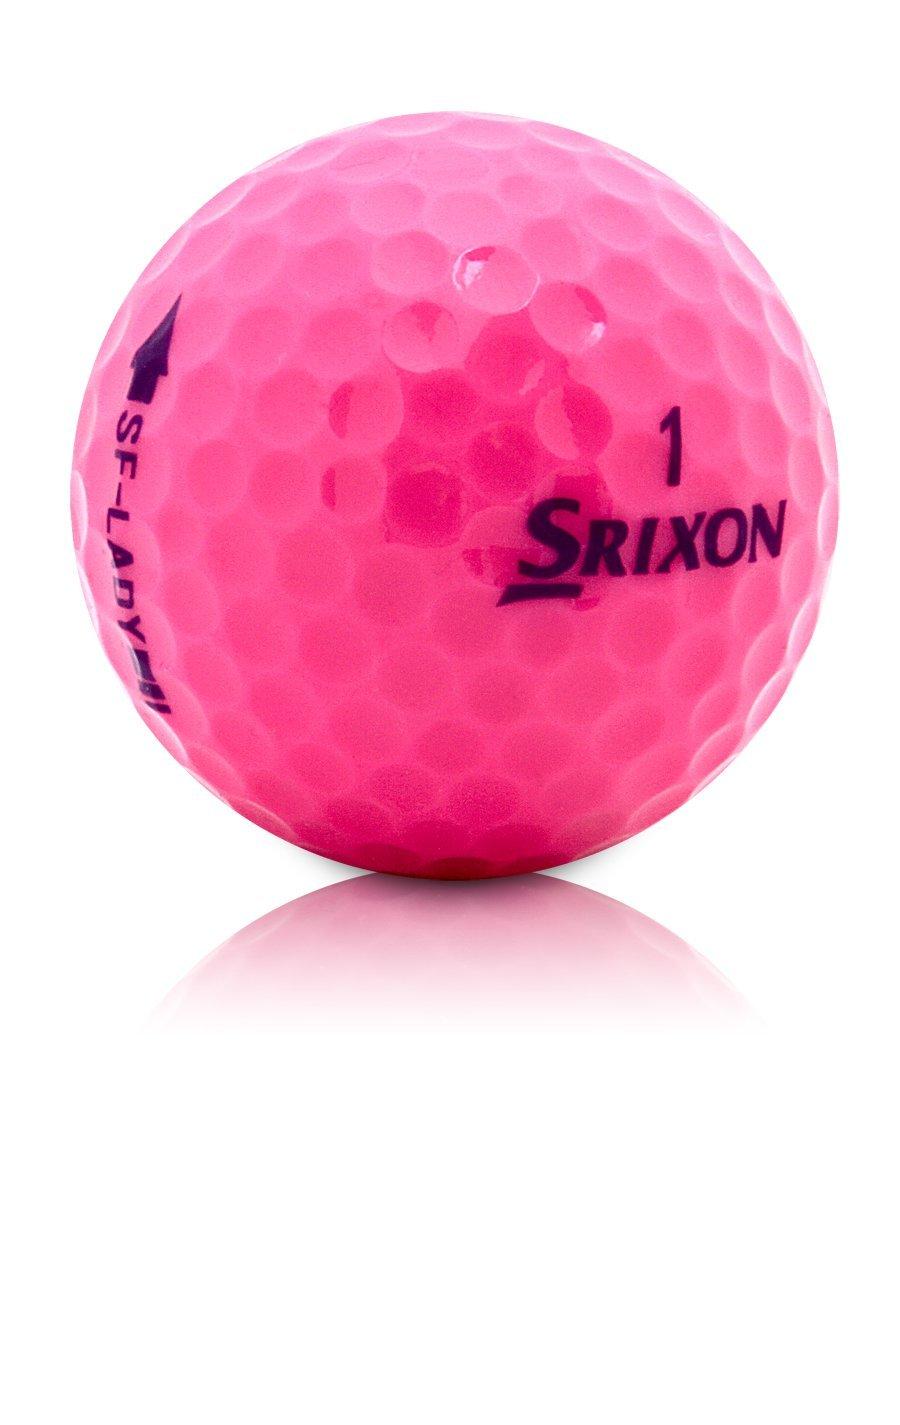 Srixon Balles De Golf Femme 12 Rose Sports Et Loisirs Bola